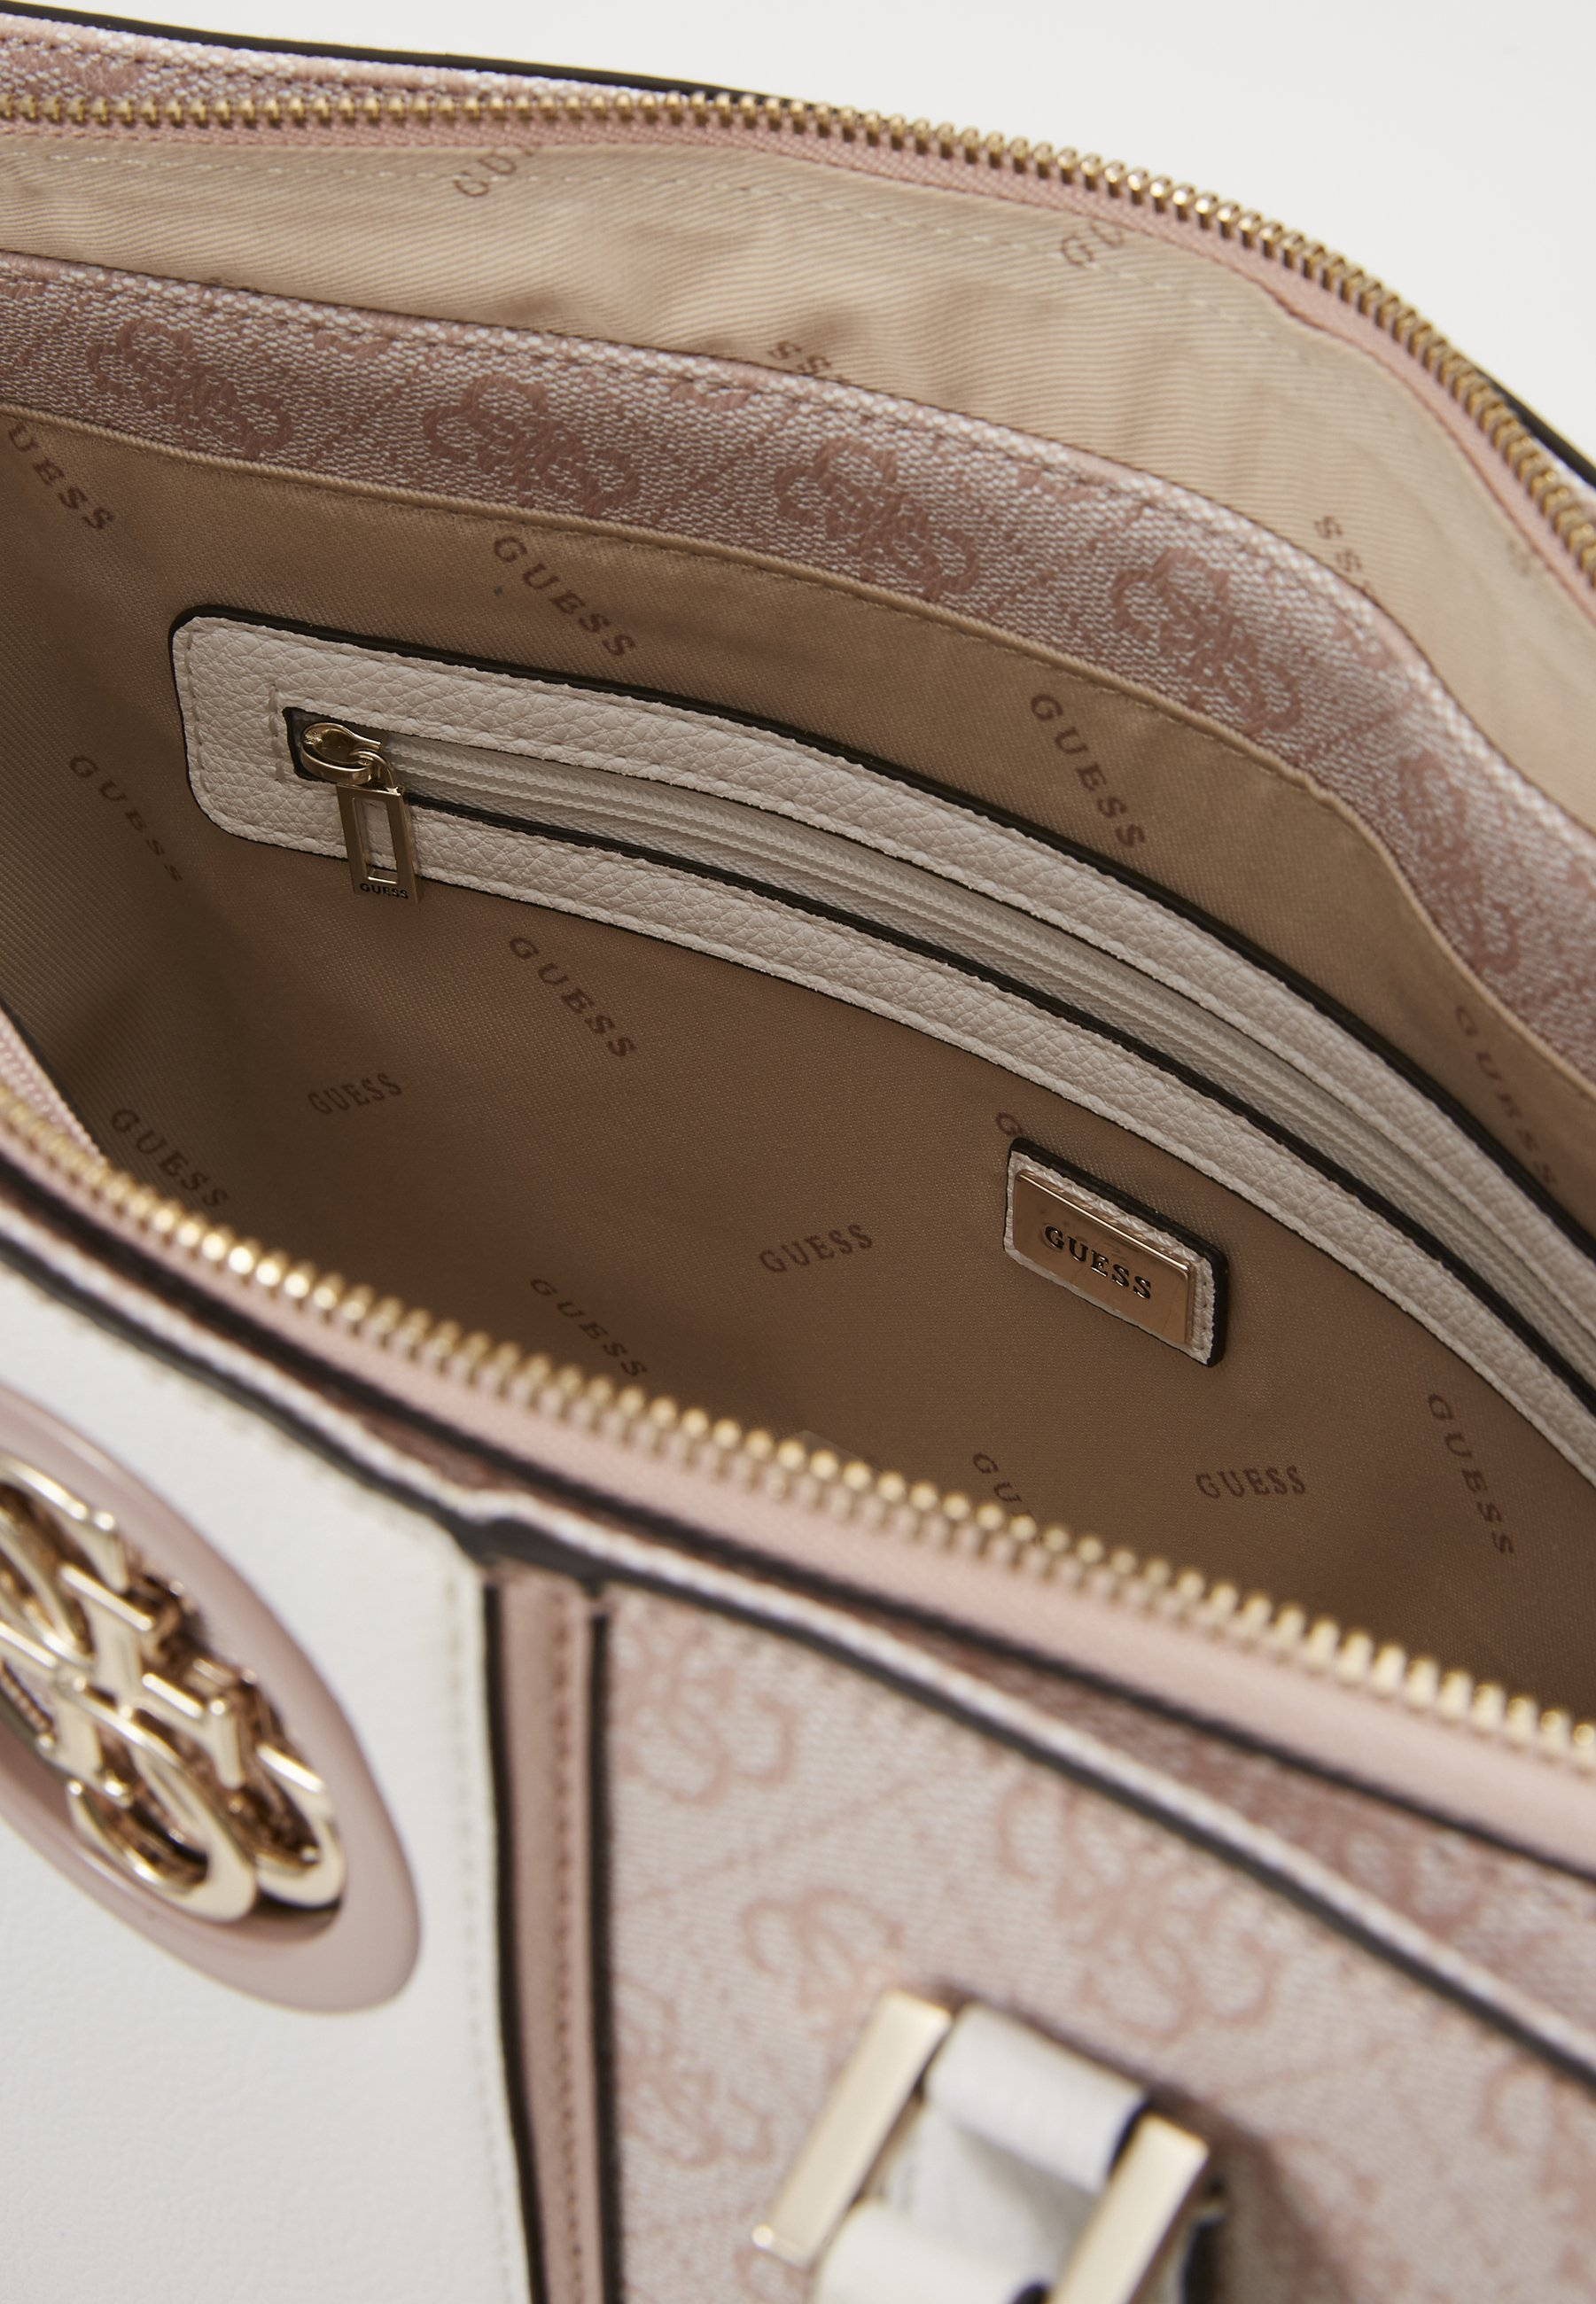 Guess Open Road Luxury Satchel - Håndtasker Blush